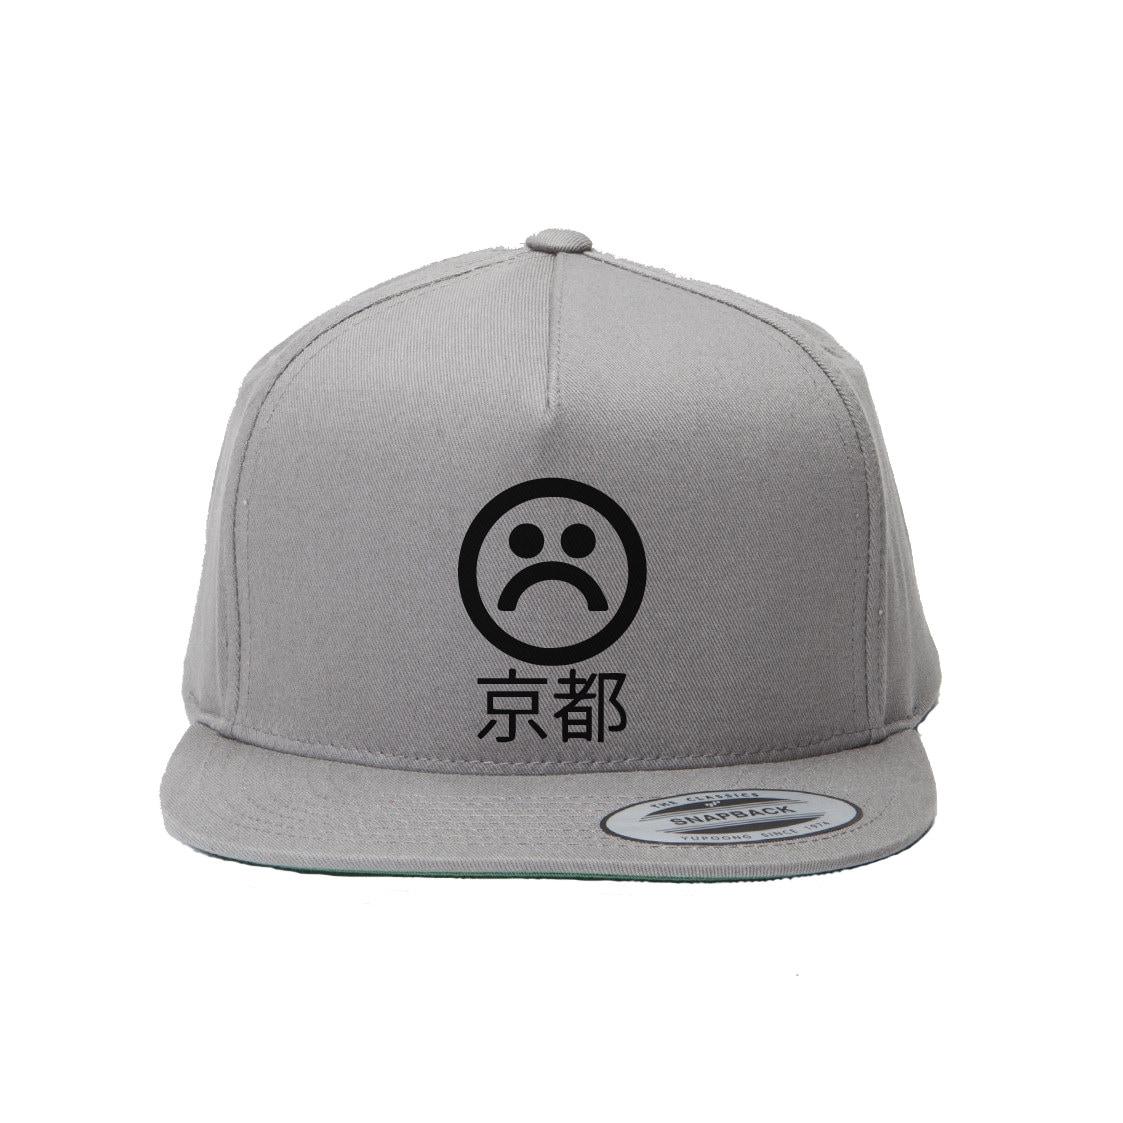 Sad Boys by  DopePremium Very Rare Japan snapback cap  4 ... c576283492db